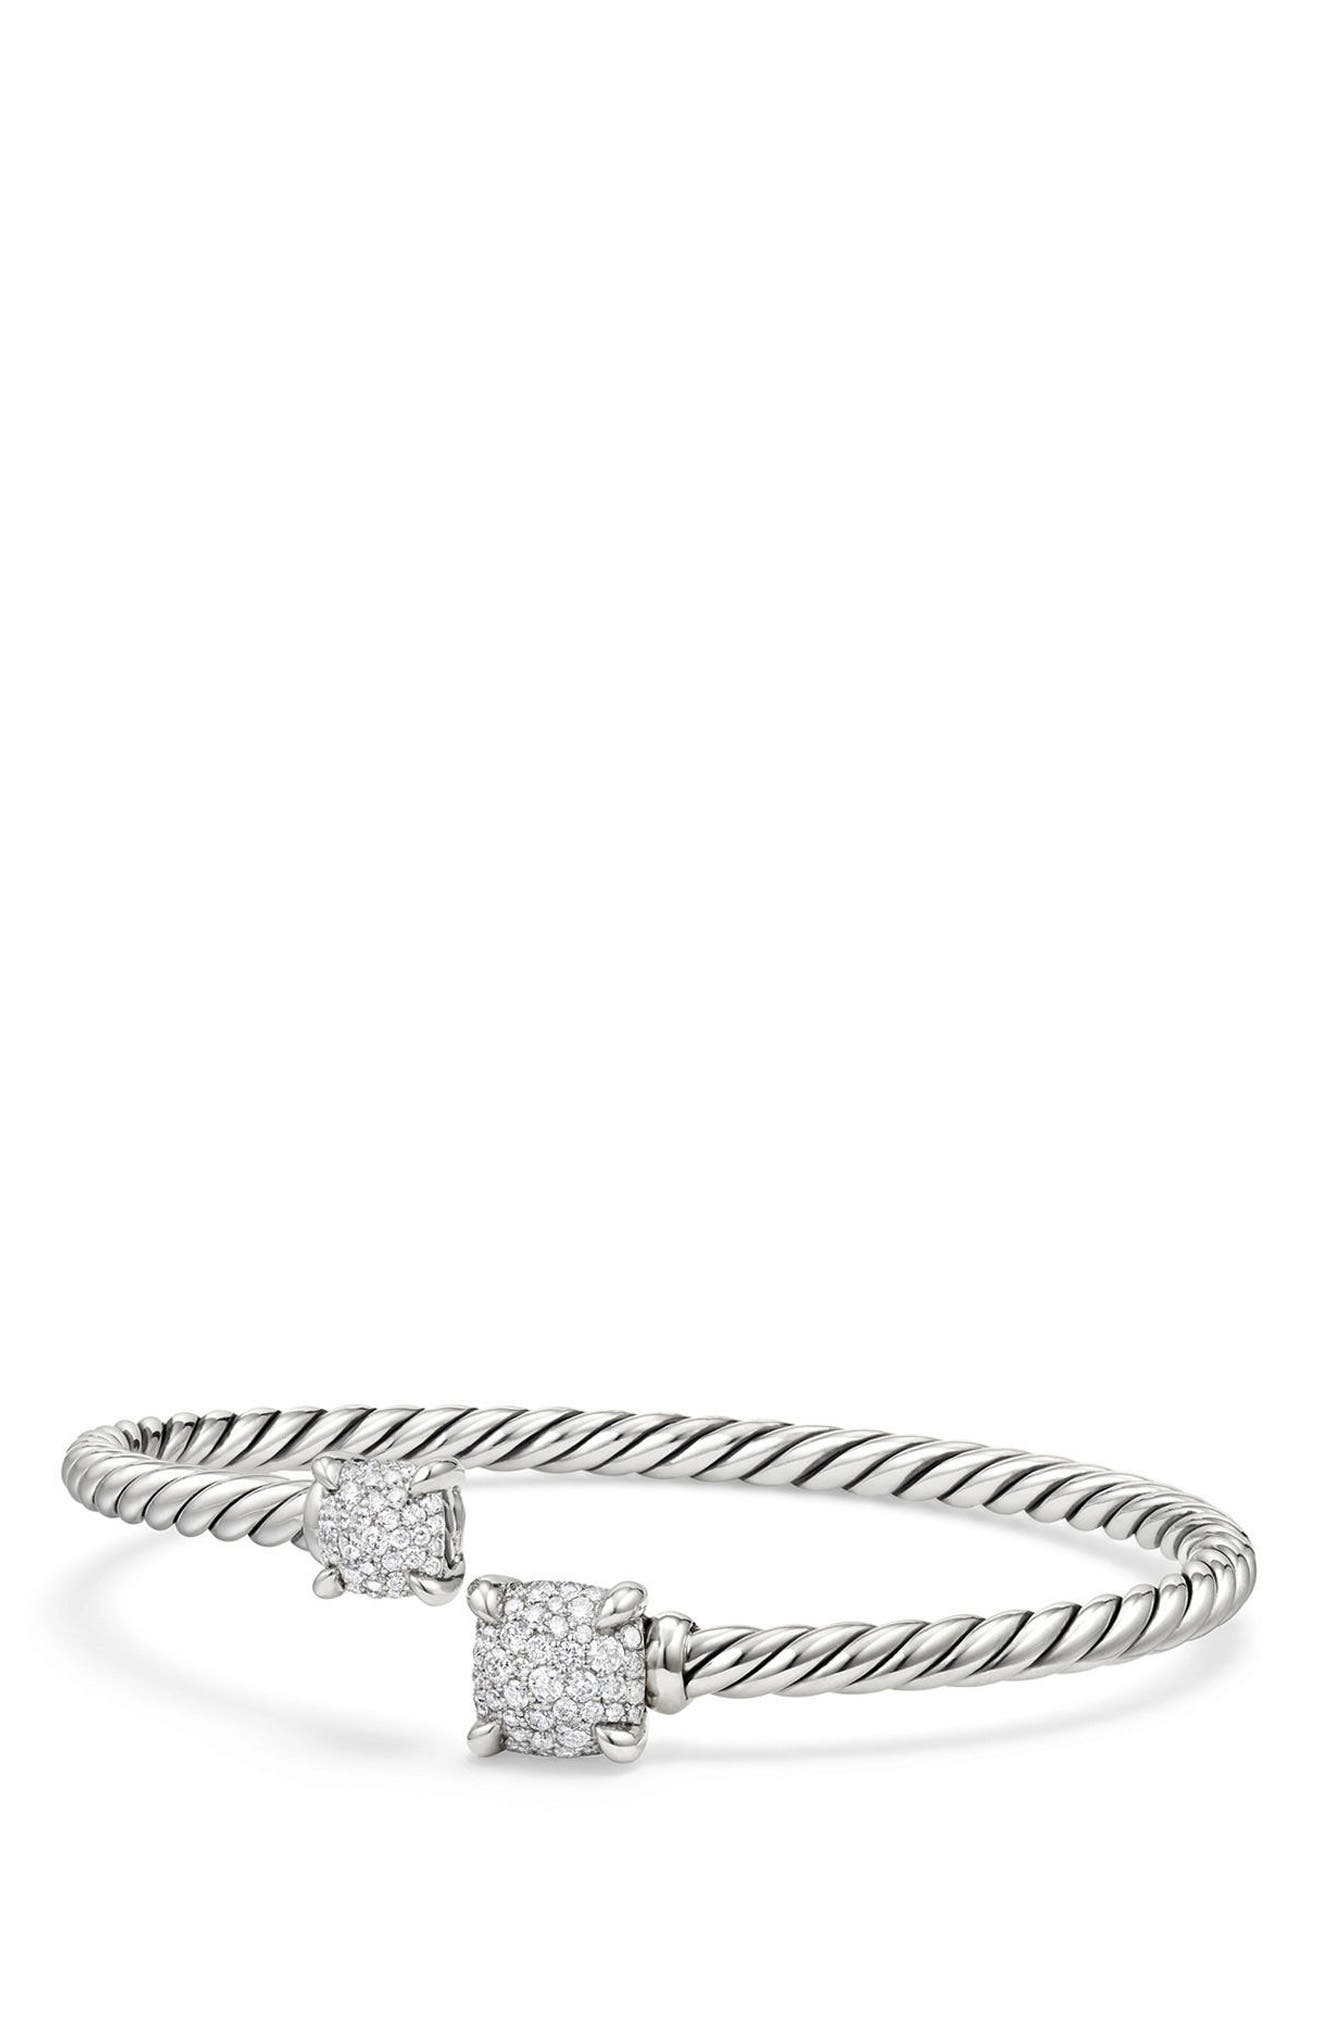 Châtelaine Bypass Bracelet with Diamonds,                         Main,                         color, Silver